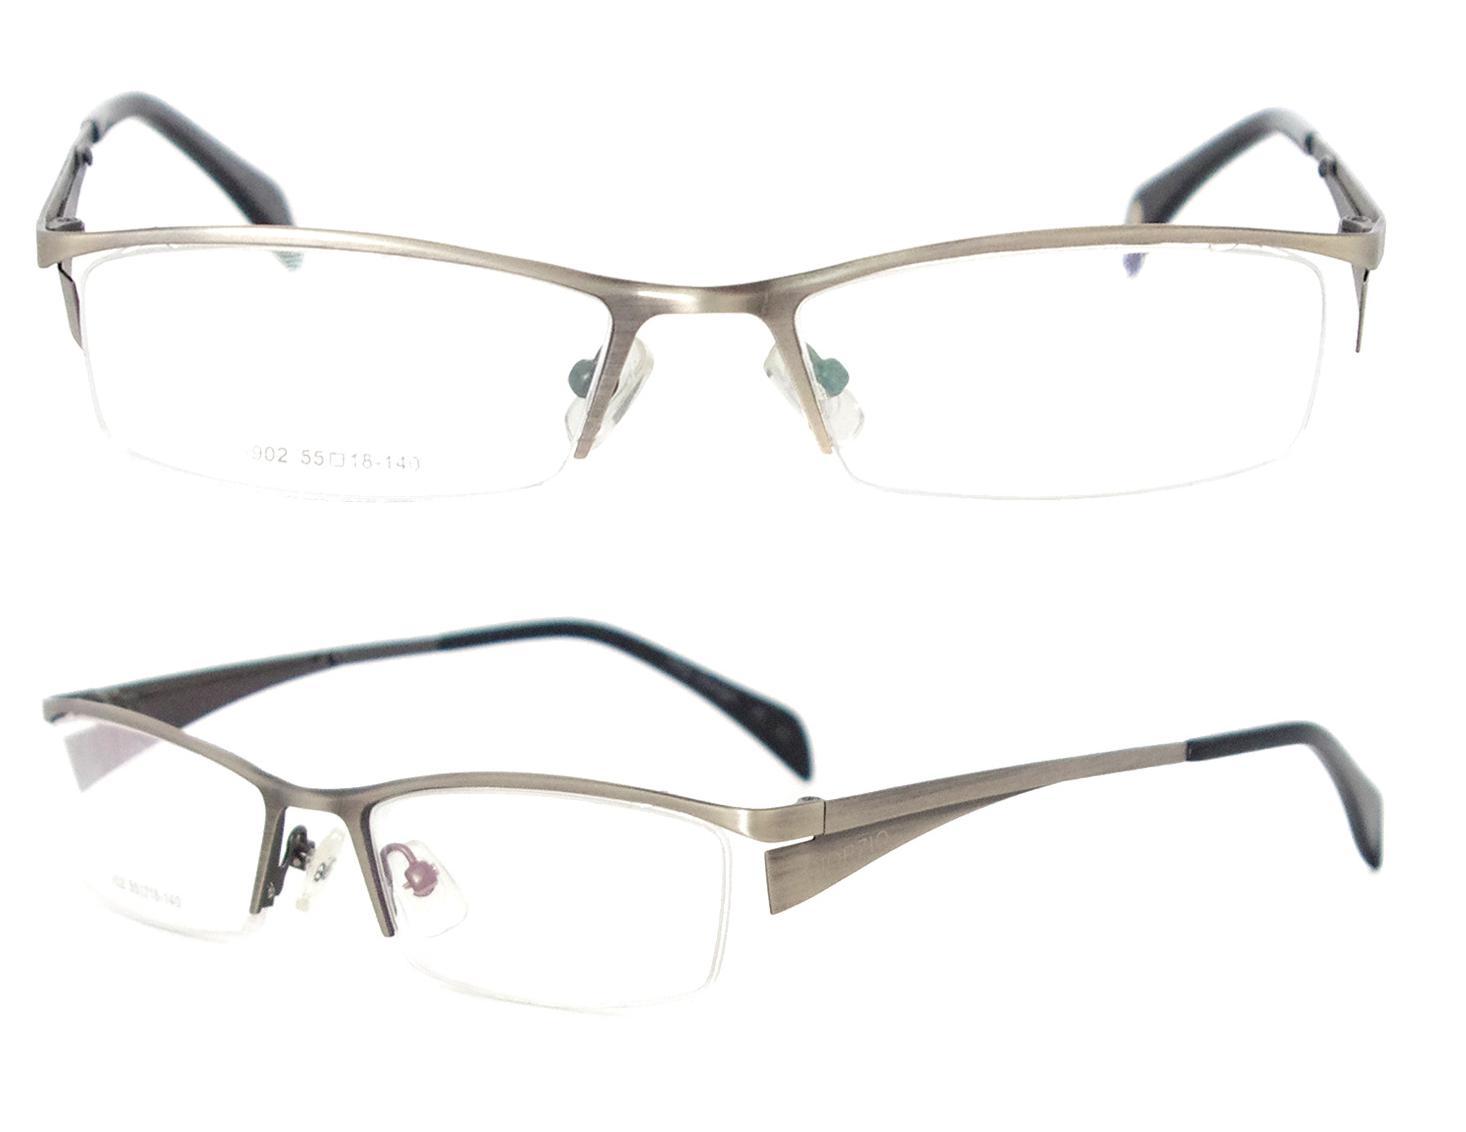 a222e4eb1a Metal Alloy 10pcs wholesale high quality half rim men framesEyeglasses Frame  Frames For Glasses .